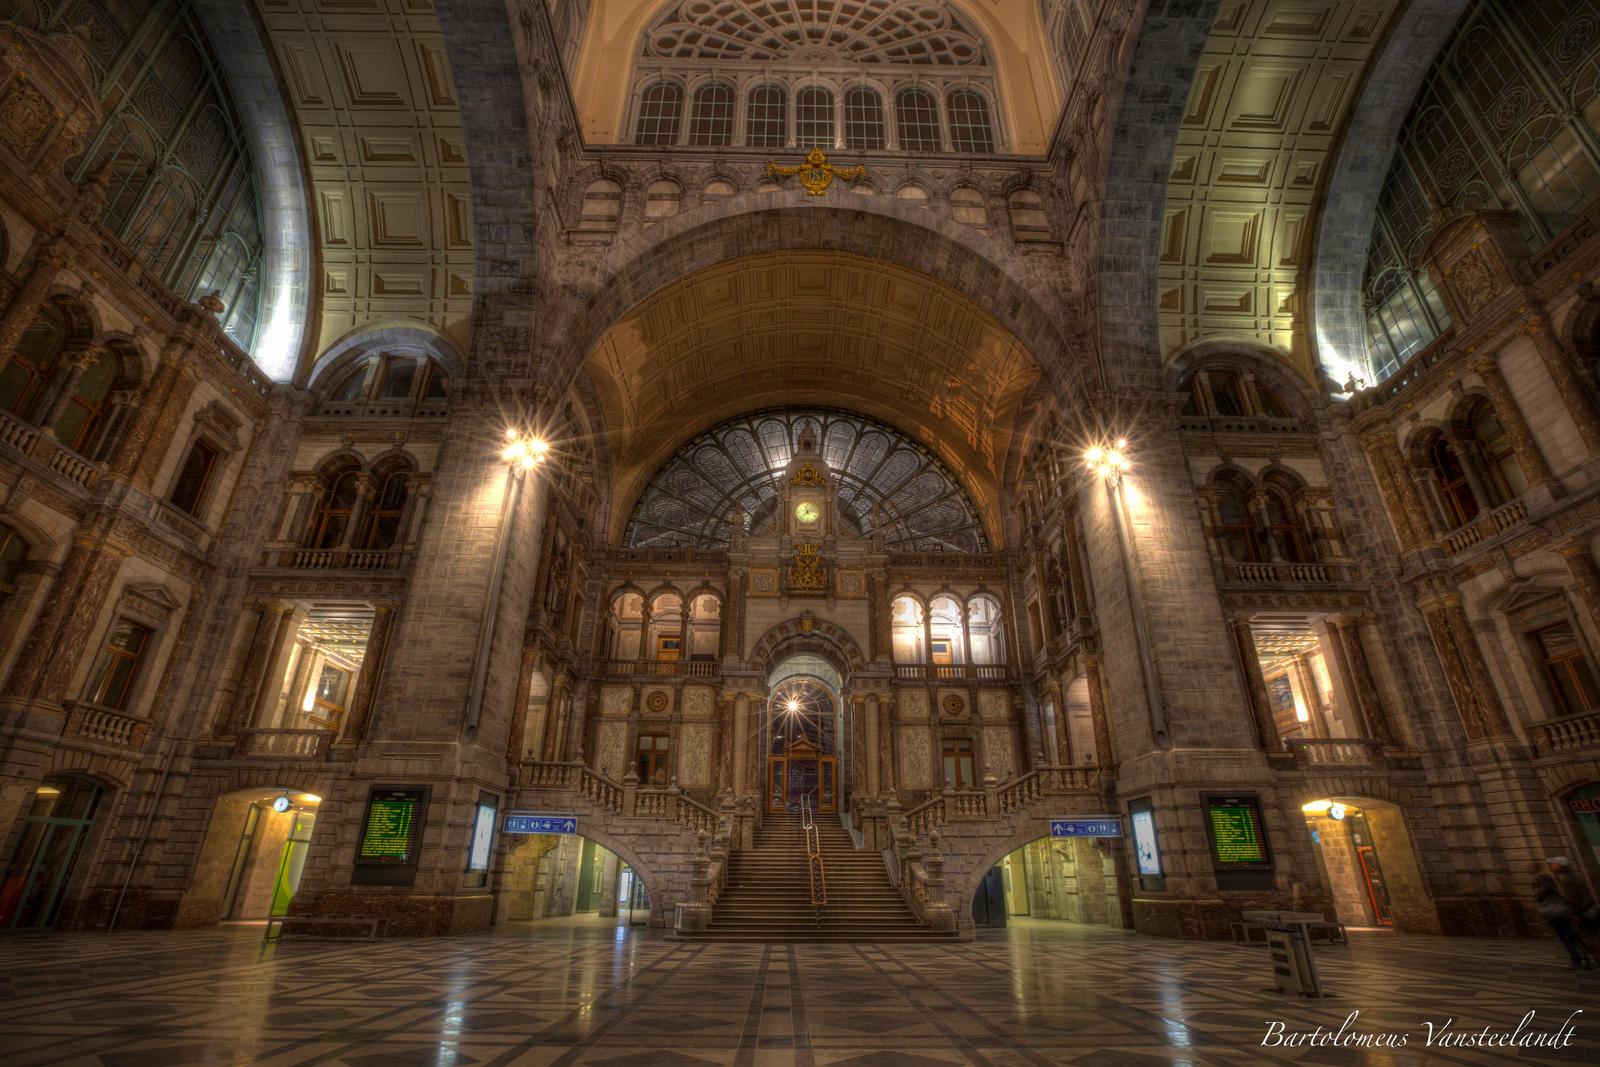 Central station antwerp belgium by bartoloman on deviantart for Interieur antwerpen